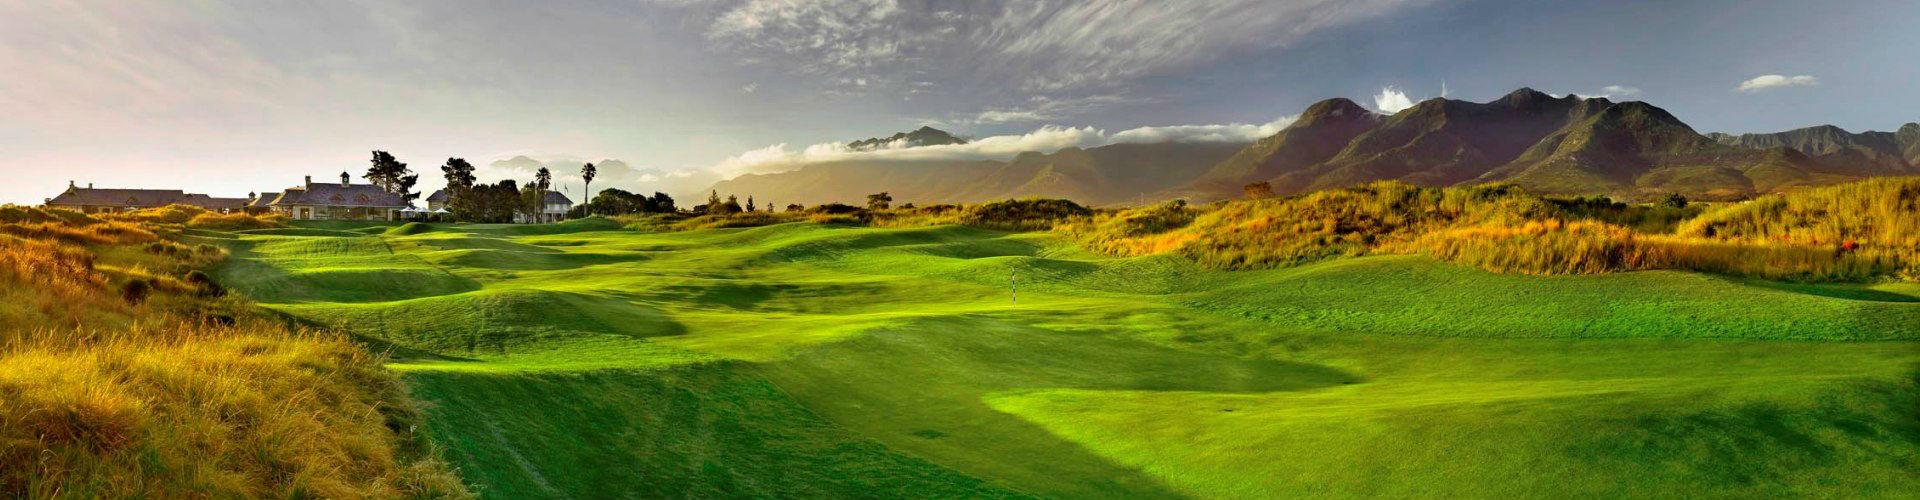 Golfresor Sydafrika - golfreseguiden.se